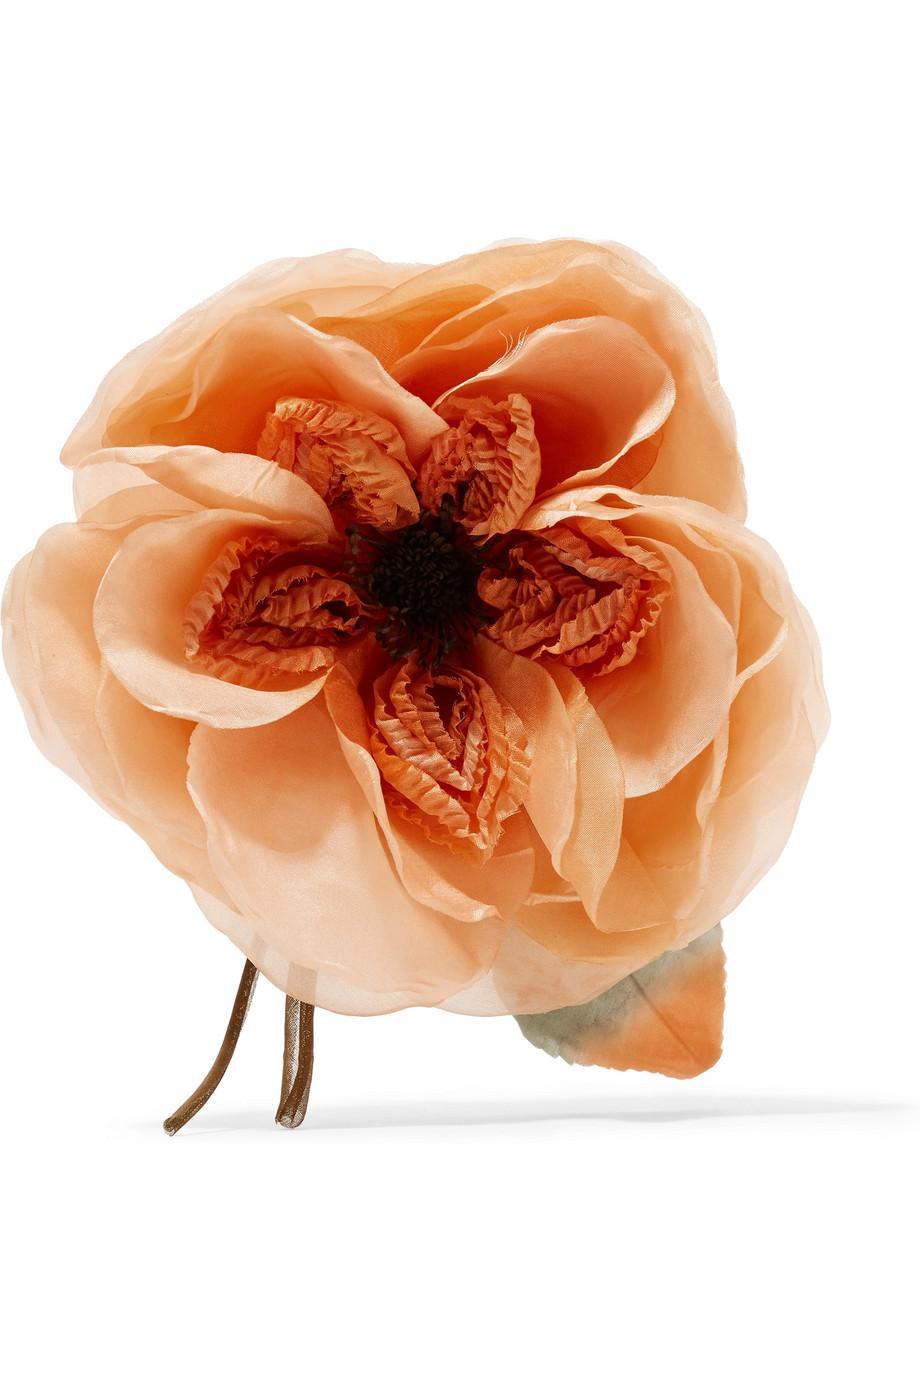 Gucci Floral Silk Brooch - Orange NVNXfqB